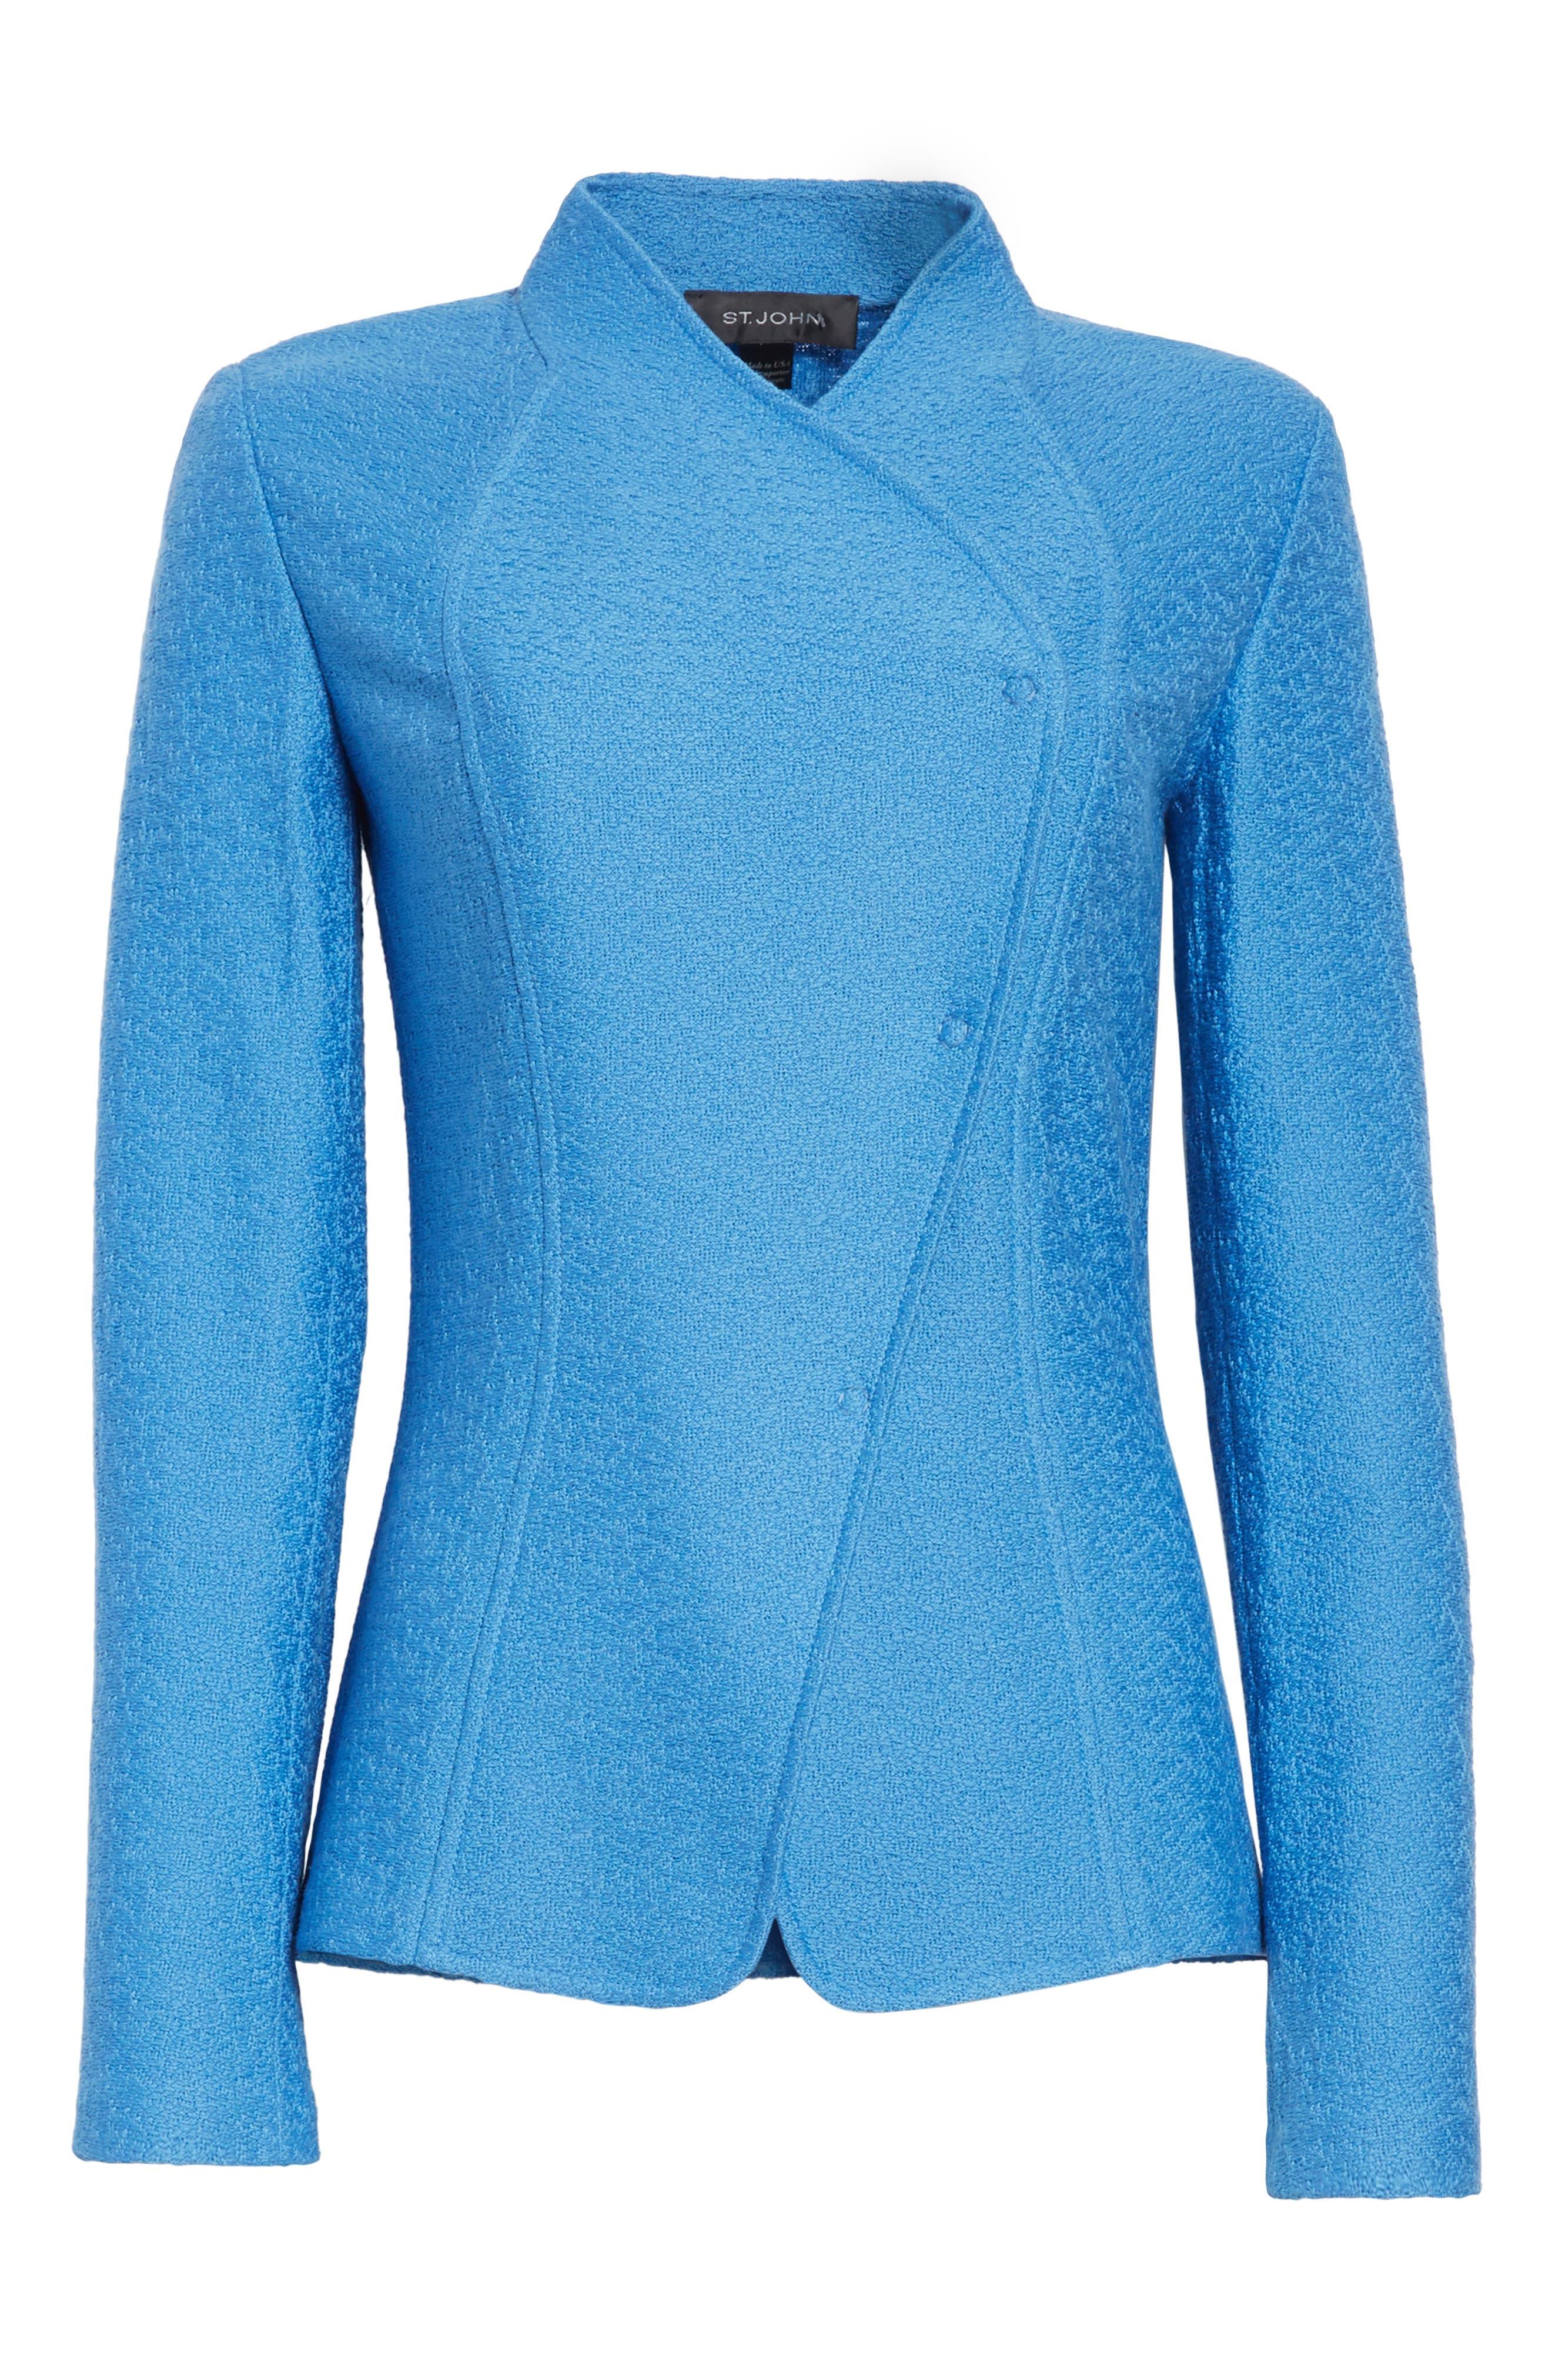 Hannah Knit Stand Collar Jacket,                             Alternate thumbnail 5, color,                             420